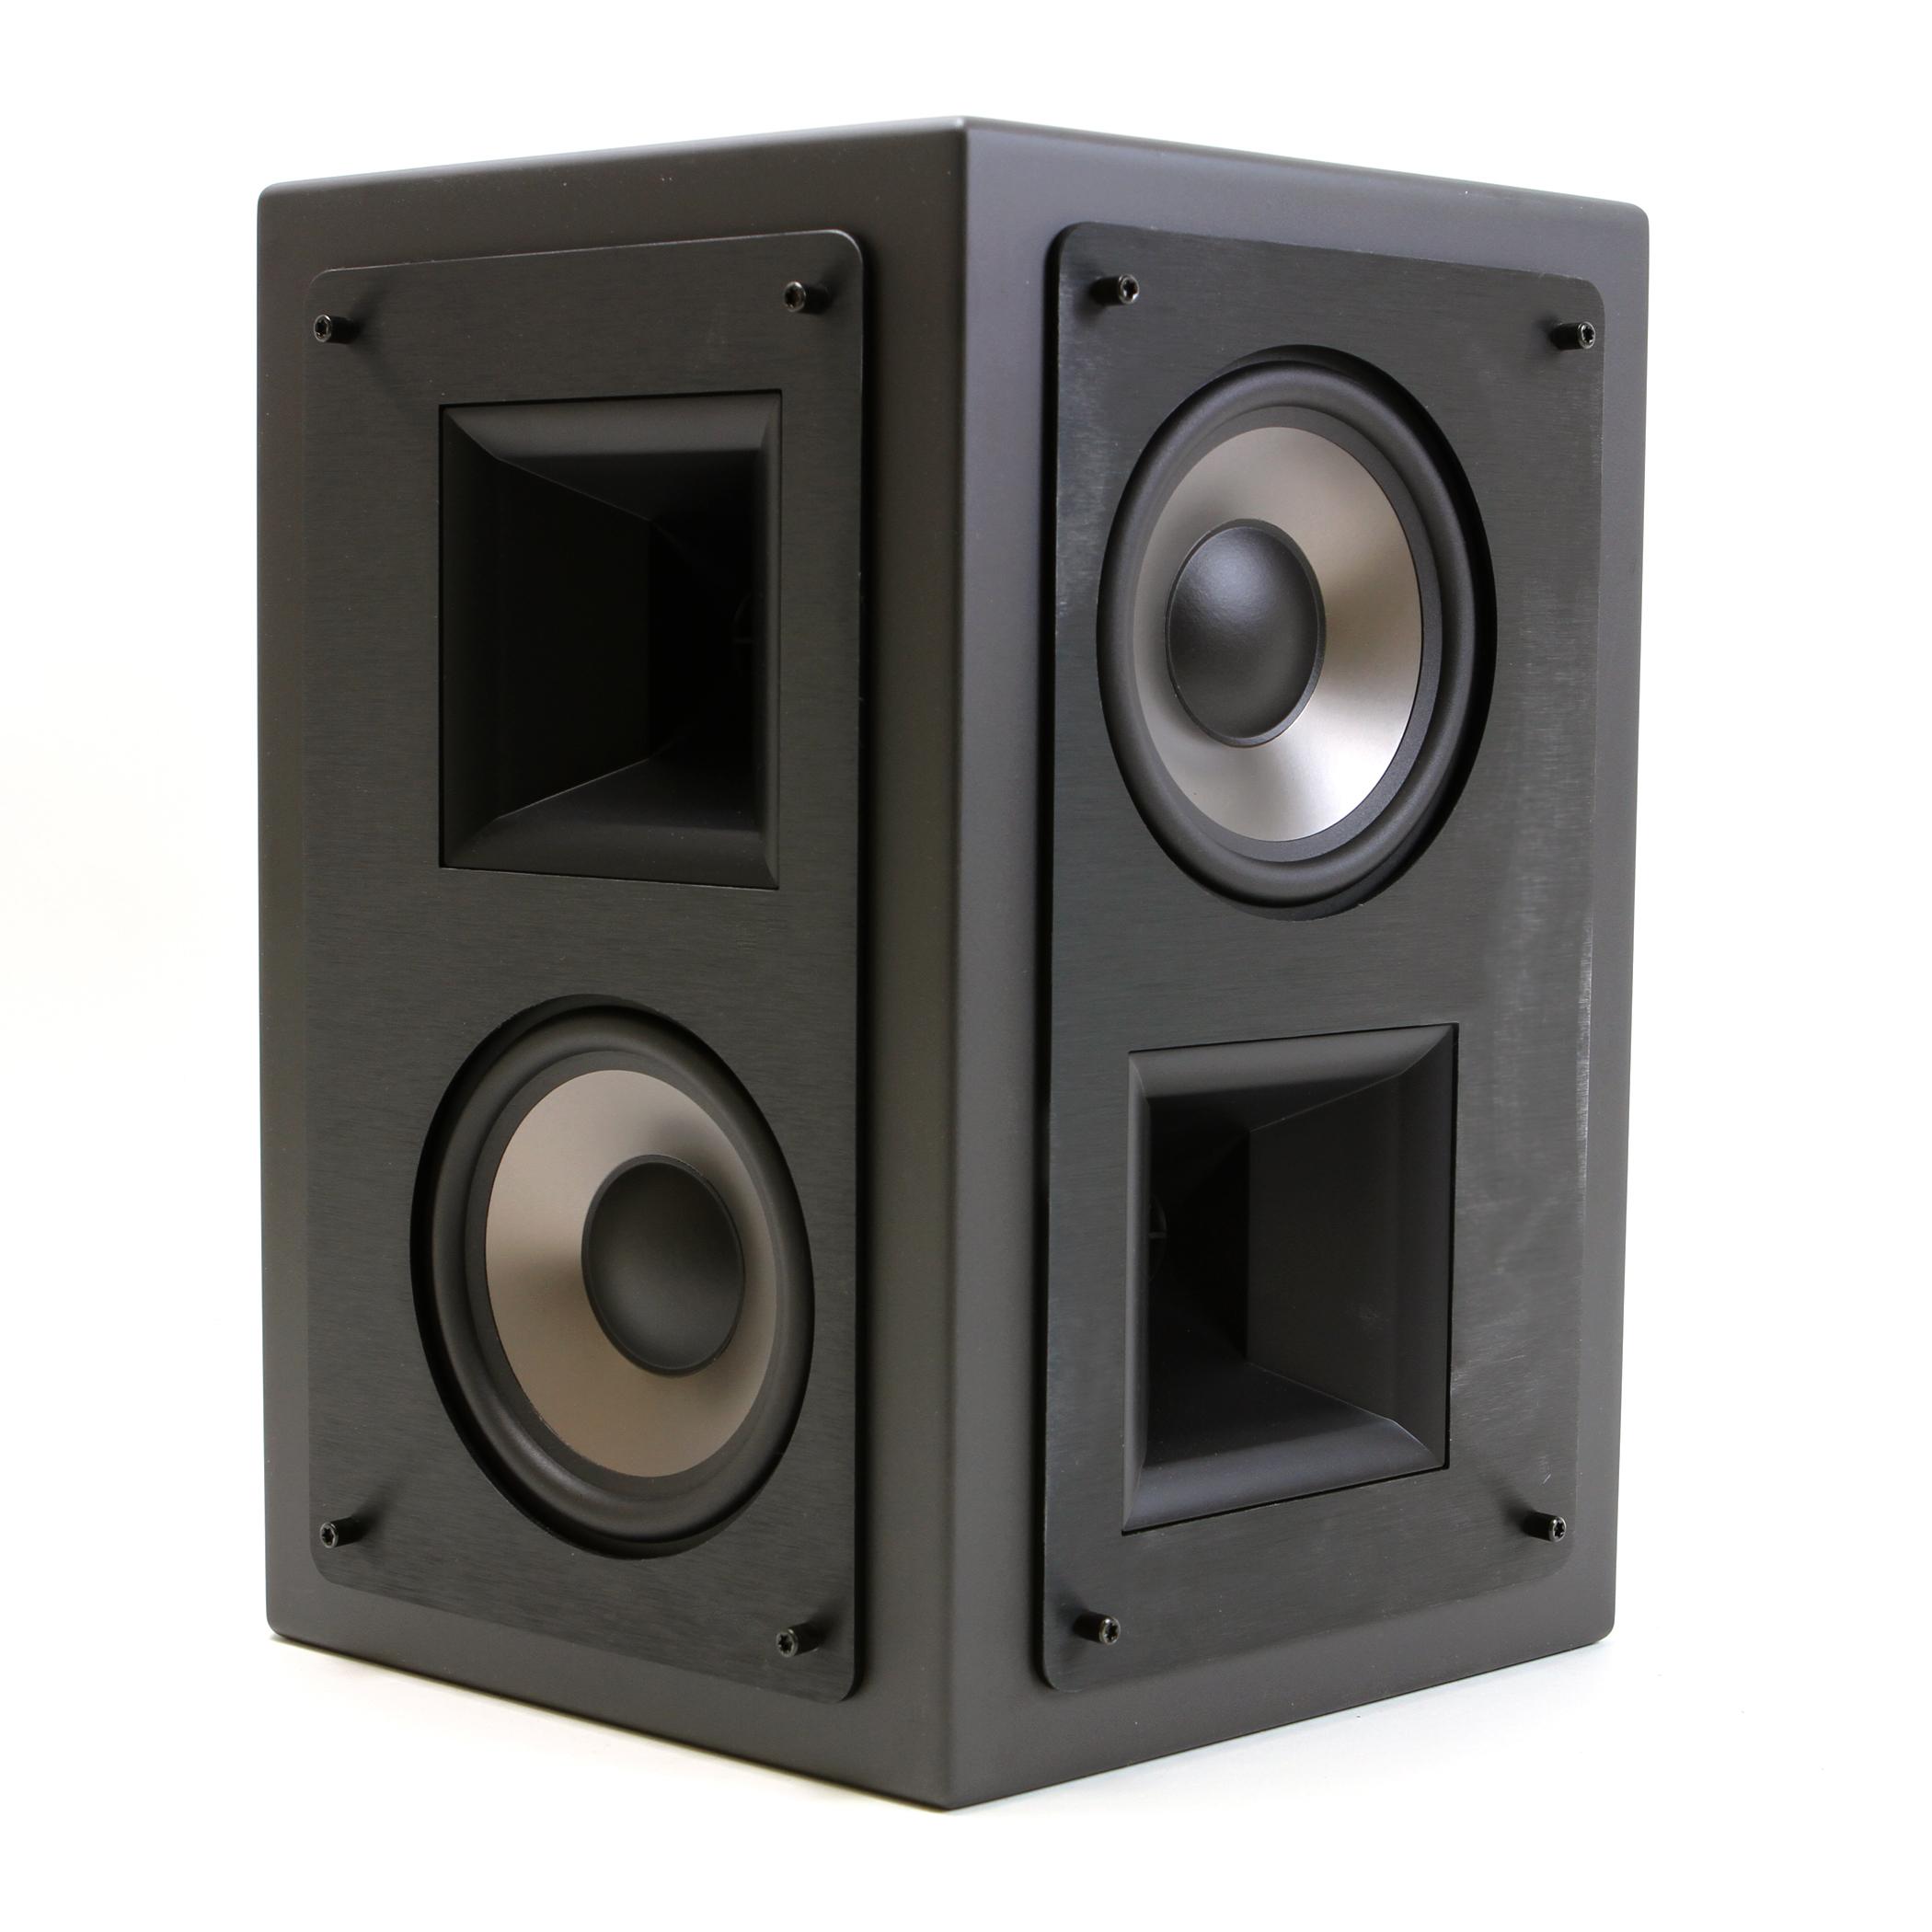 HQ Speakers Wallpapers | File 1494.67Kb